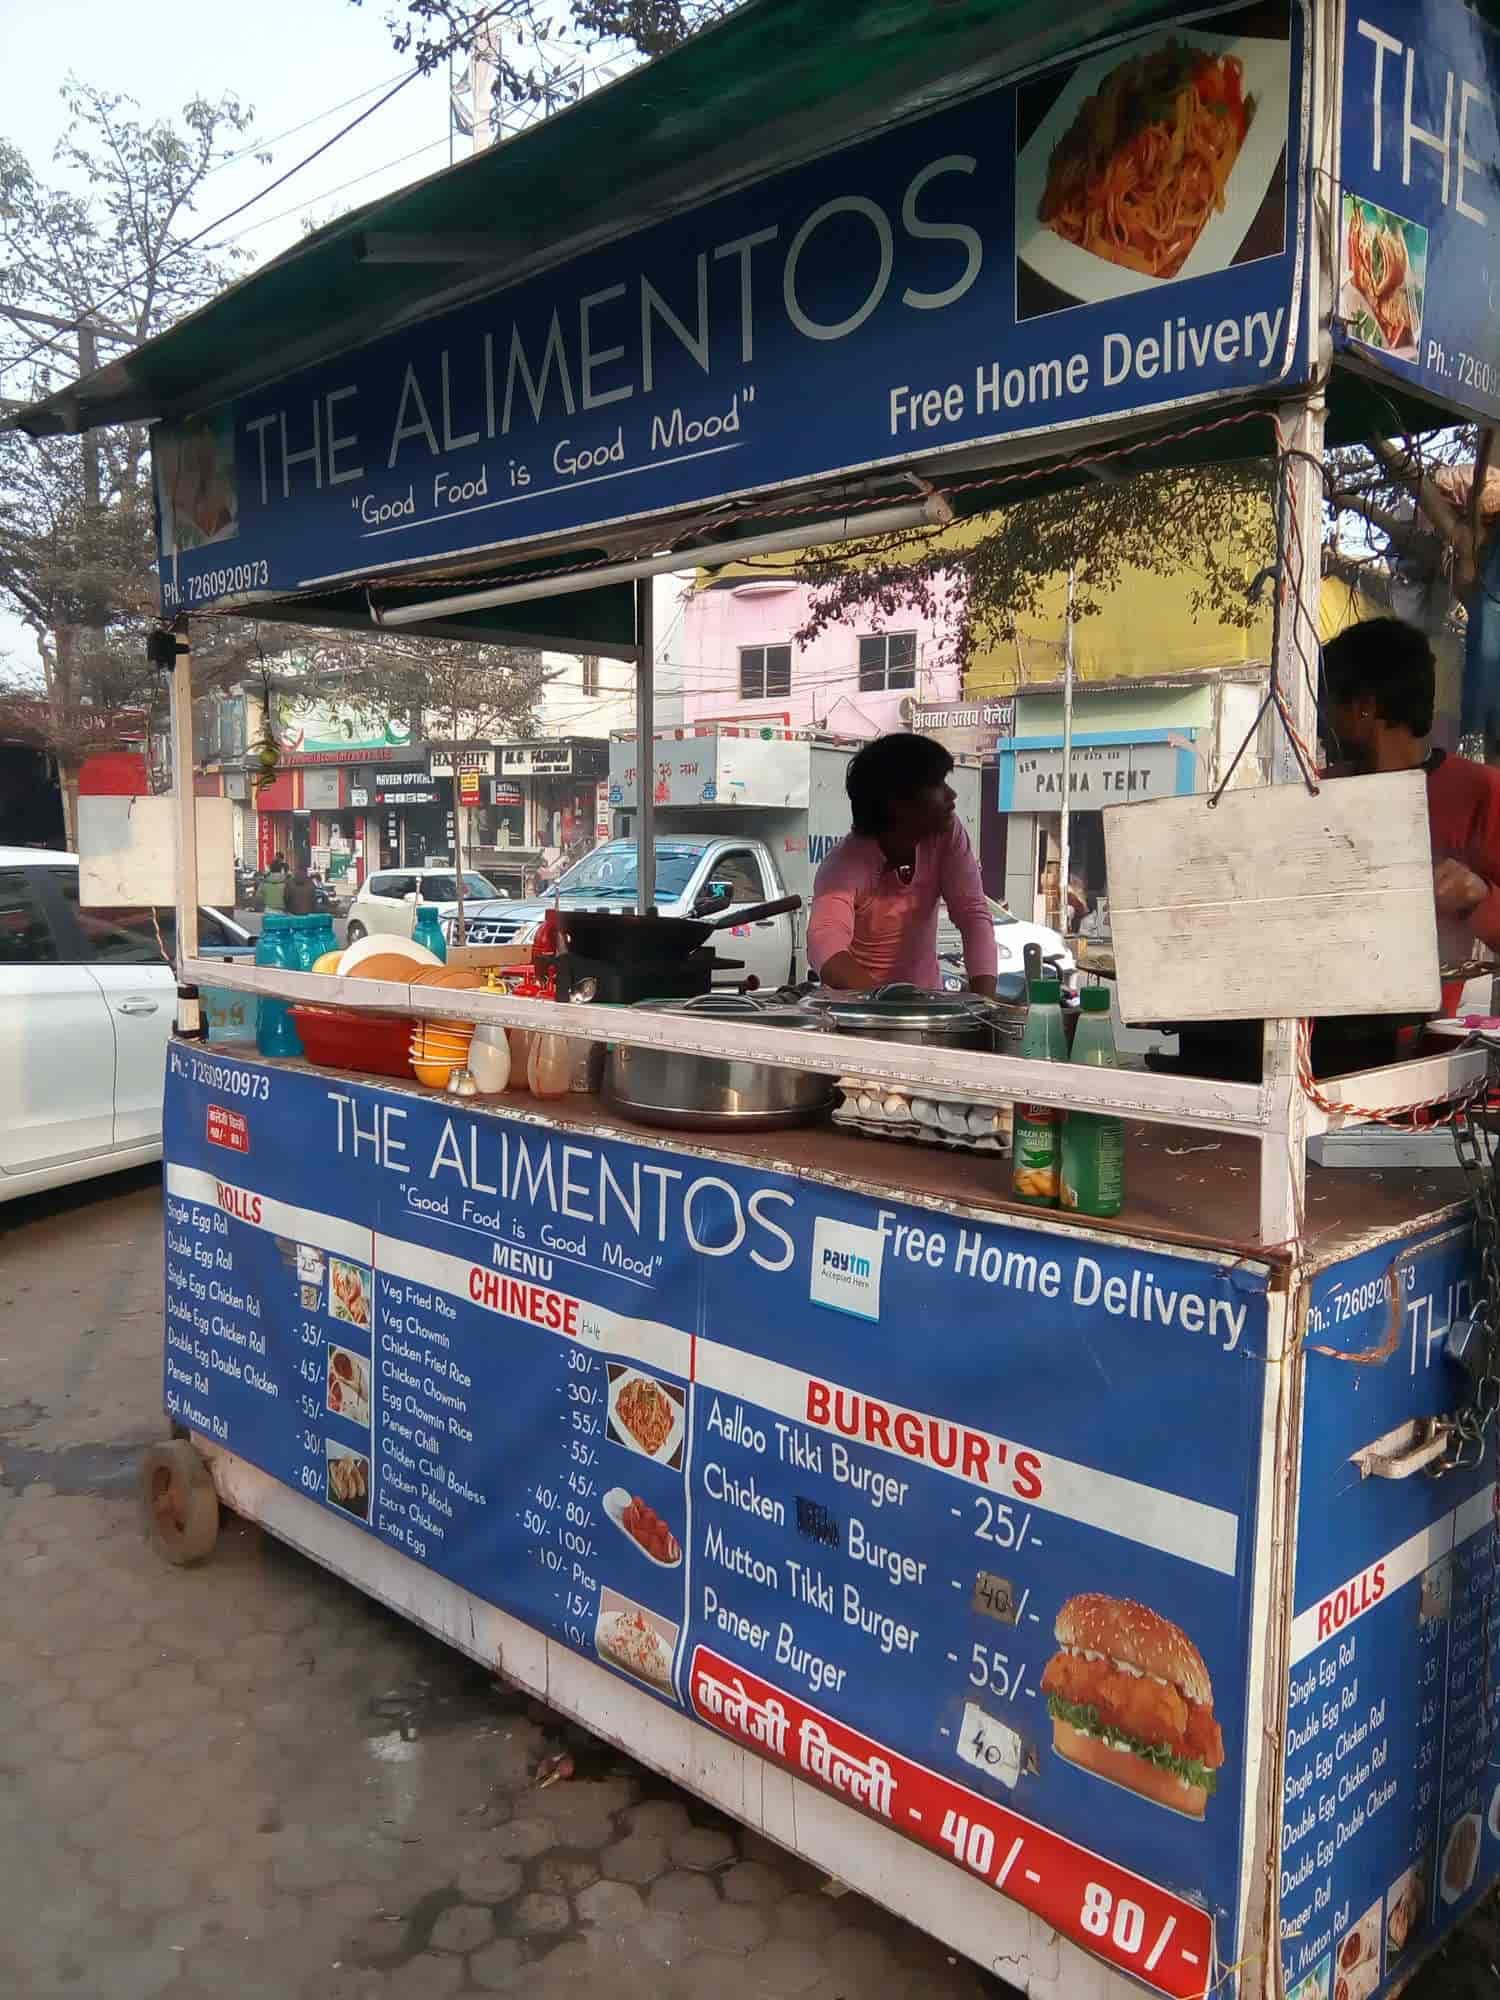 The Alimentos Good Food Is Good Mood Boring Road Patna